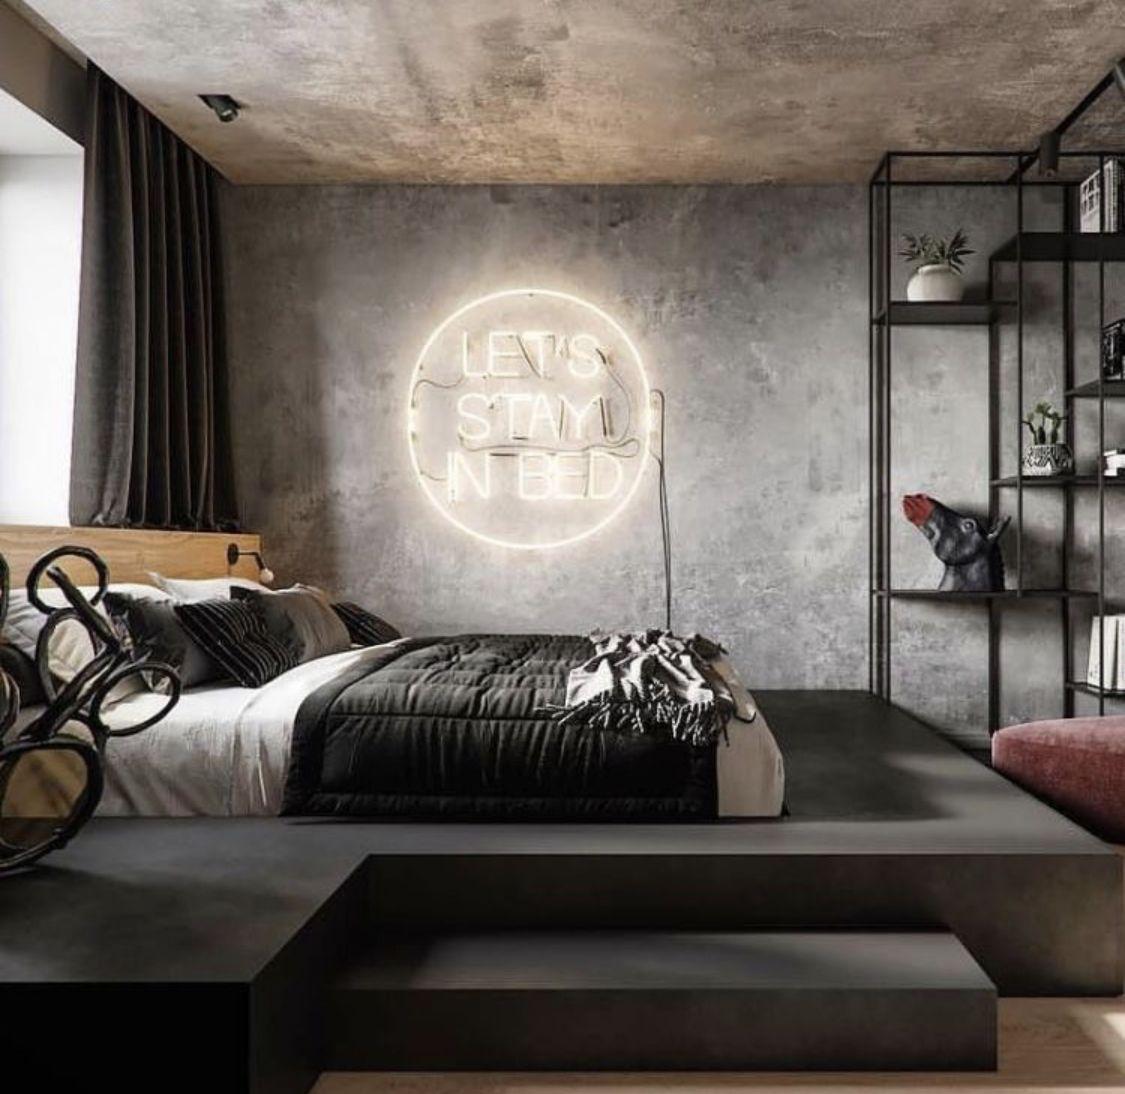 Pin By Bethany R On Design Bedroom In 2019 Bedroom Decor Bedroom Interior Industrial Bedroom Design Luxurious